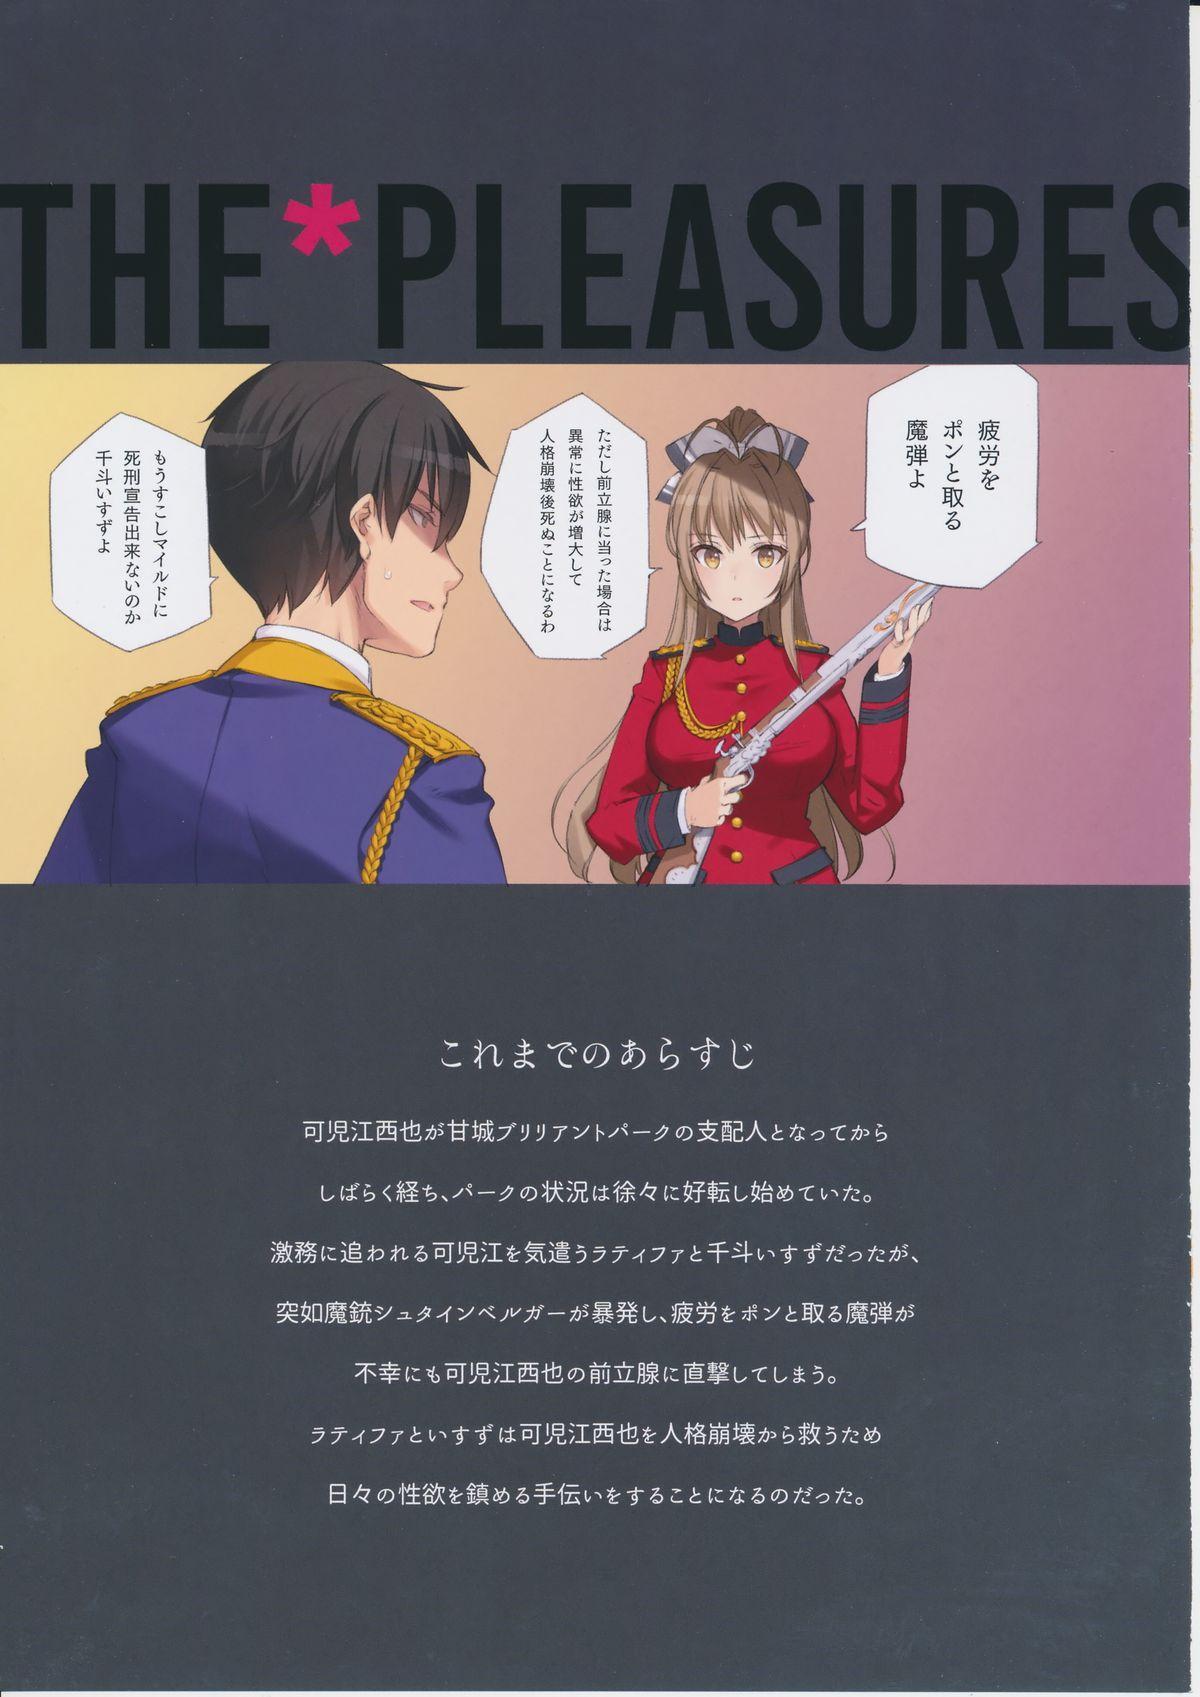 THE PLEASURES OF PRINCESSES 3